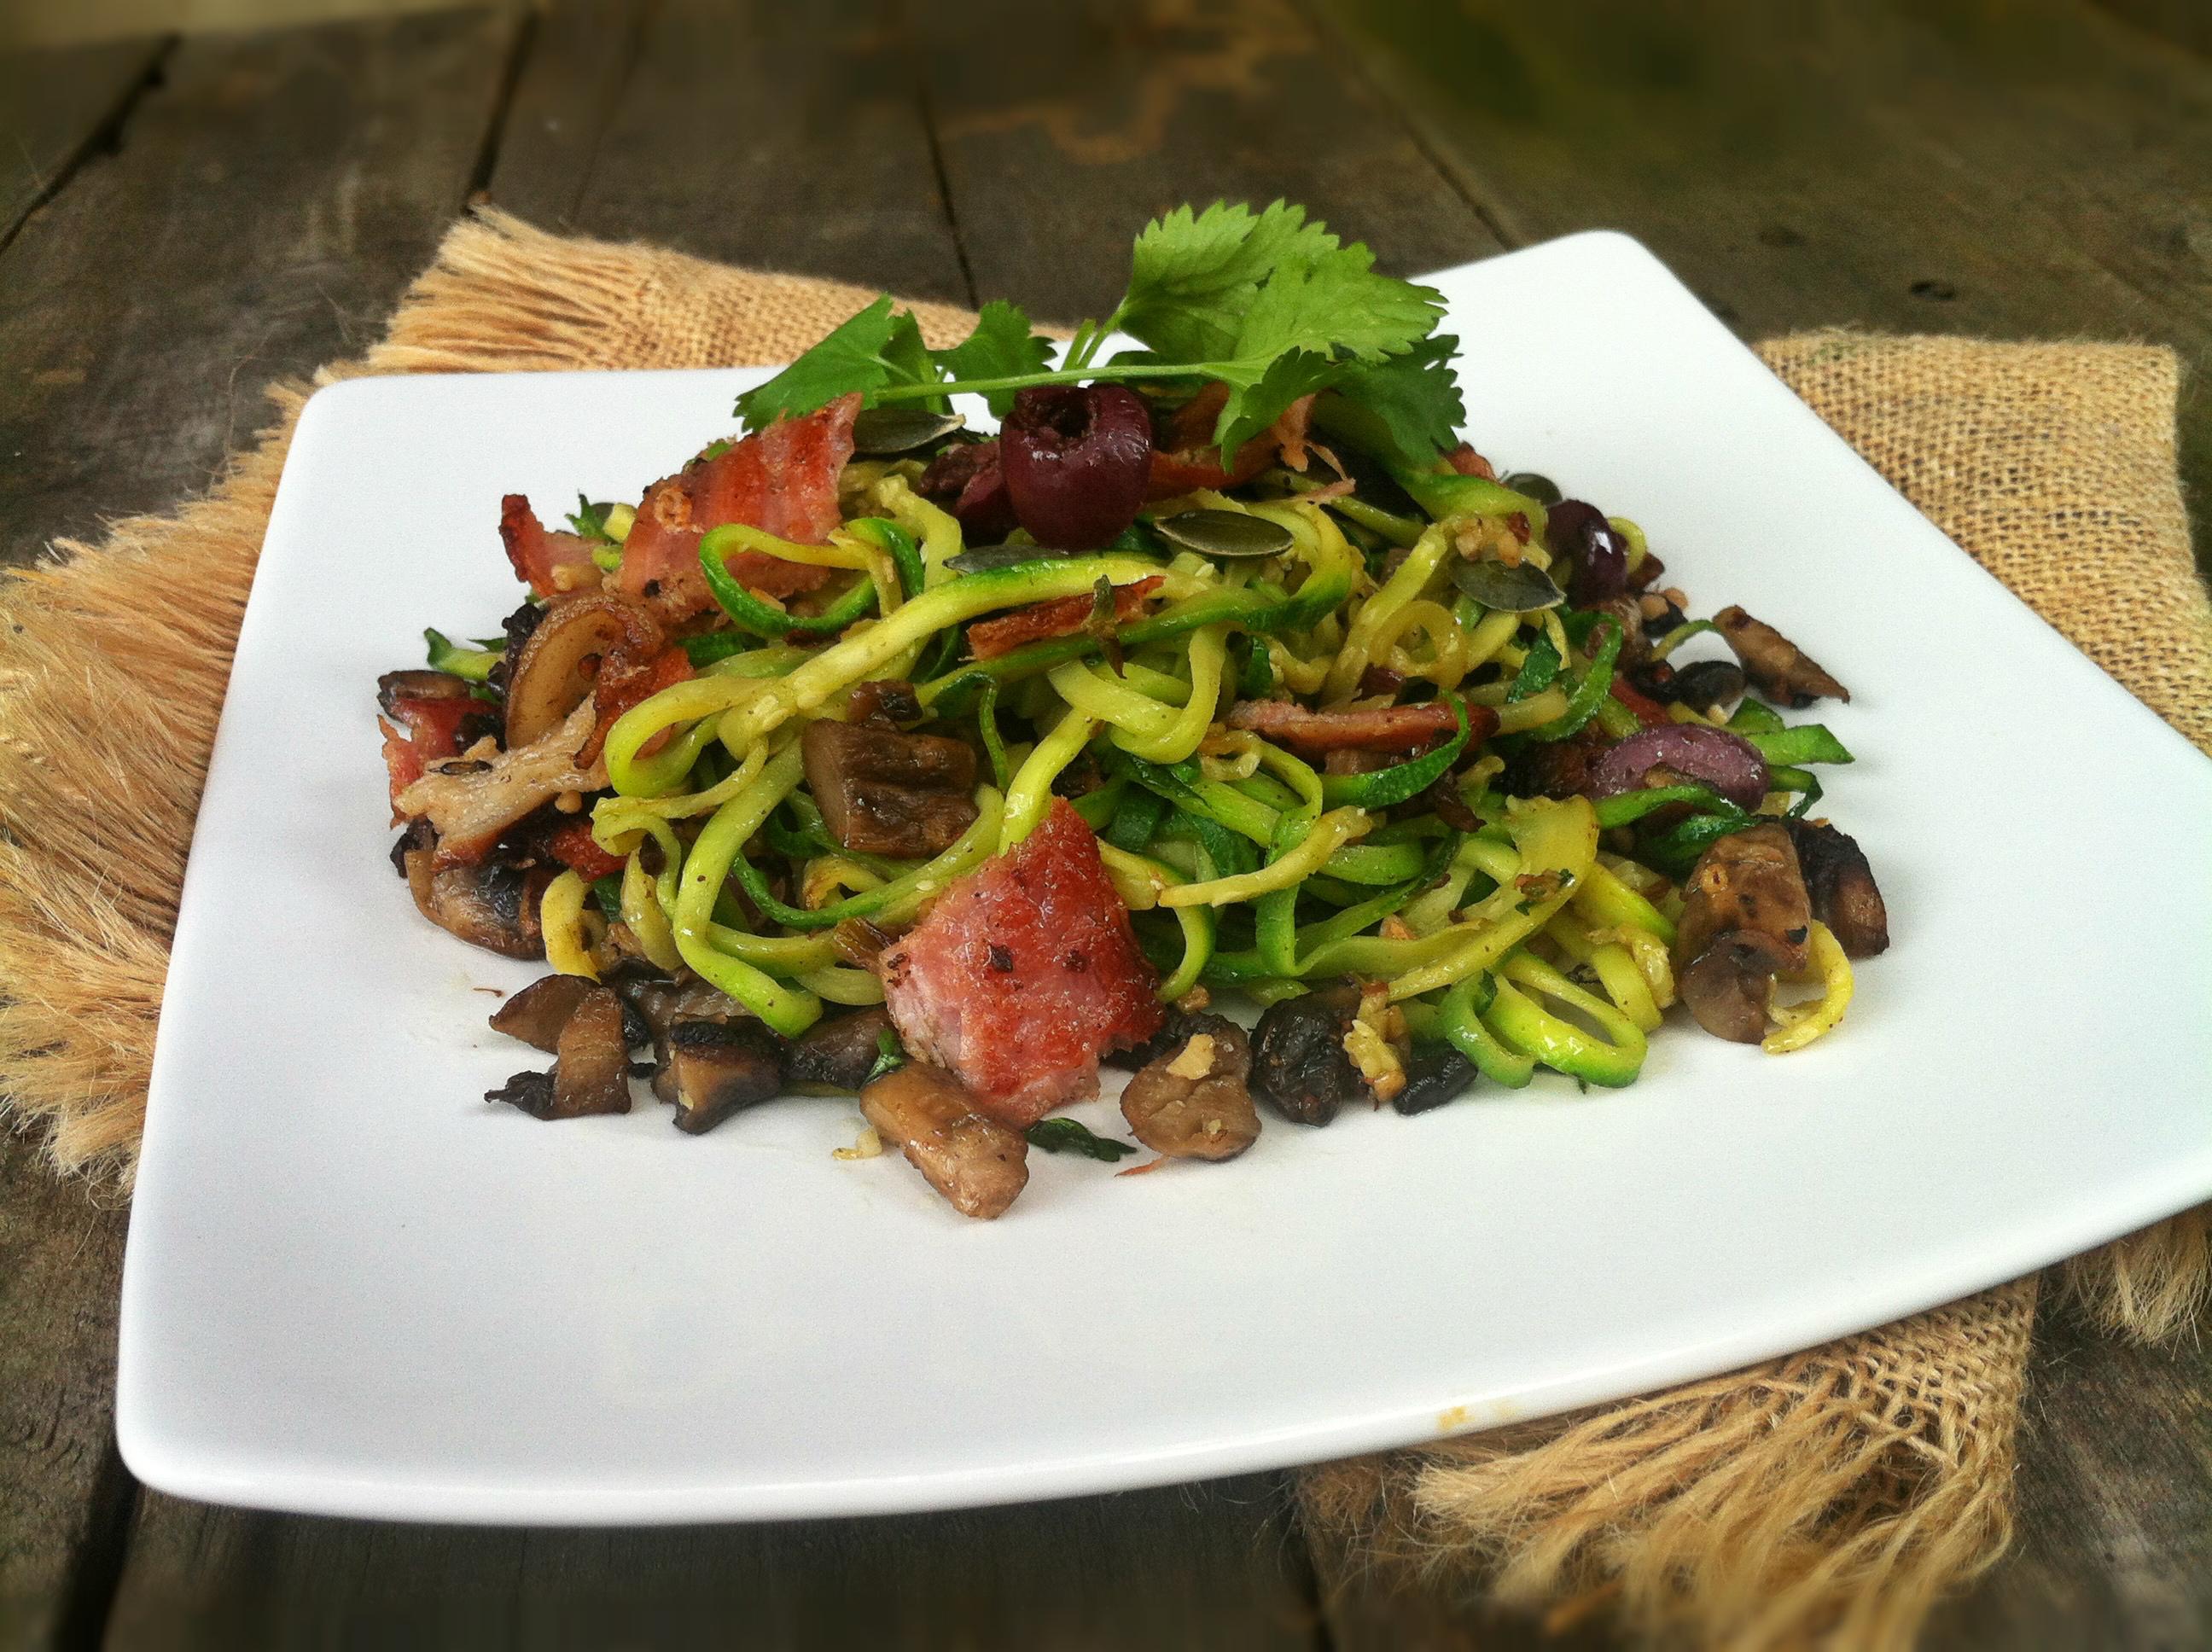 Bacon & Mushroom Courgetti